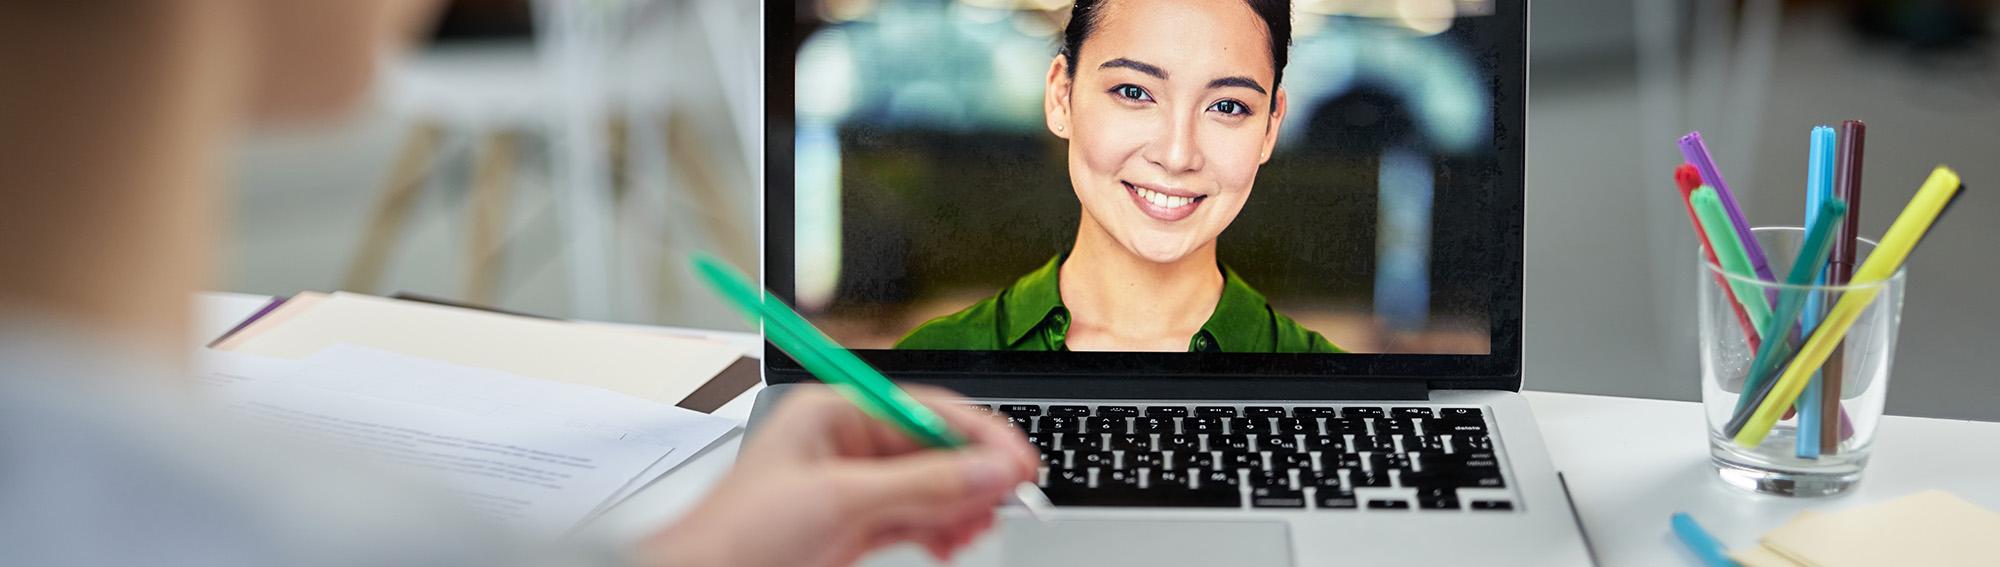 NNVA teacher on student laptop via online class